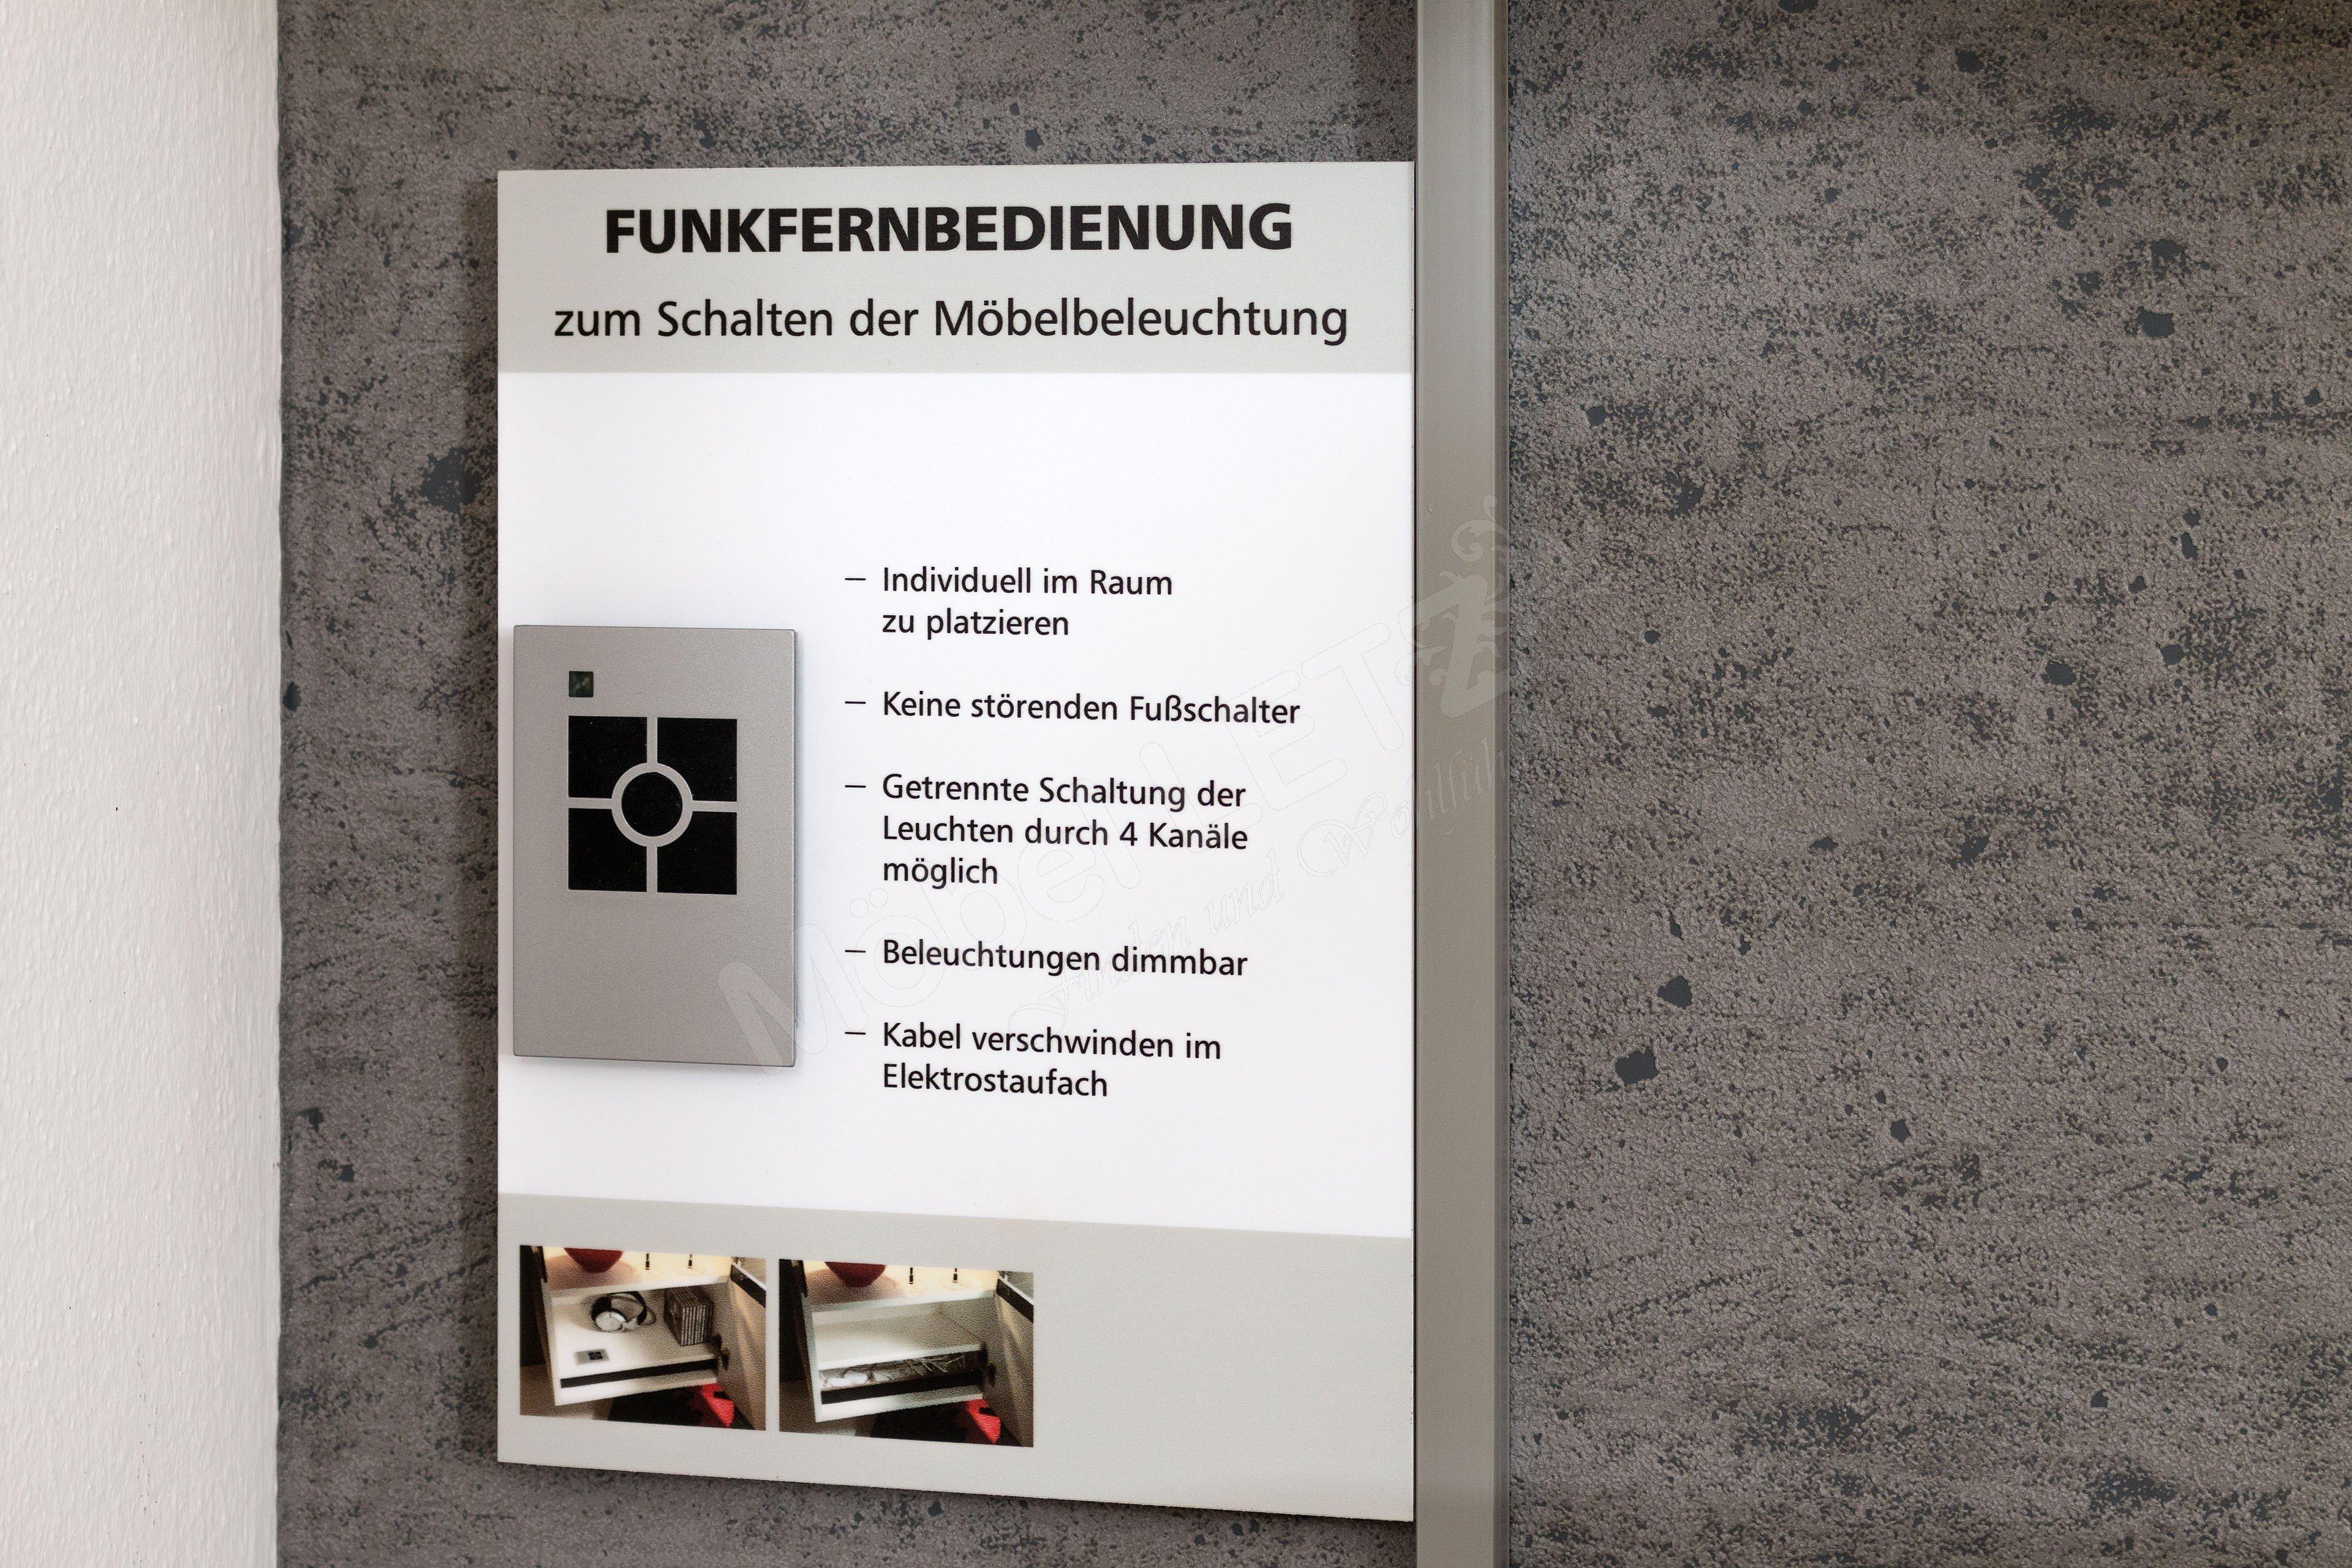 Groß 2 Wege Hausbeleuchtung Schaltung Ideen - Die Besten ...